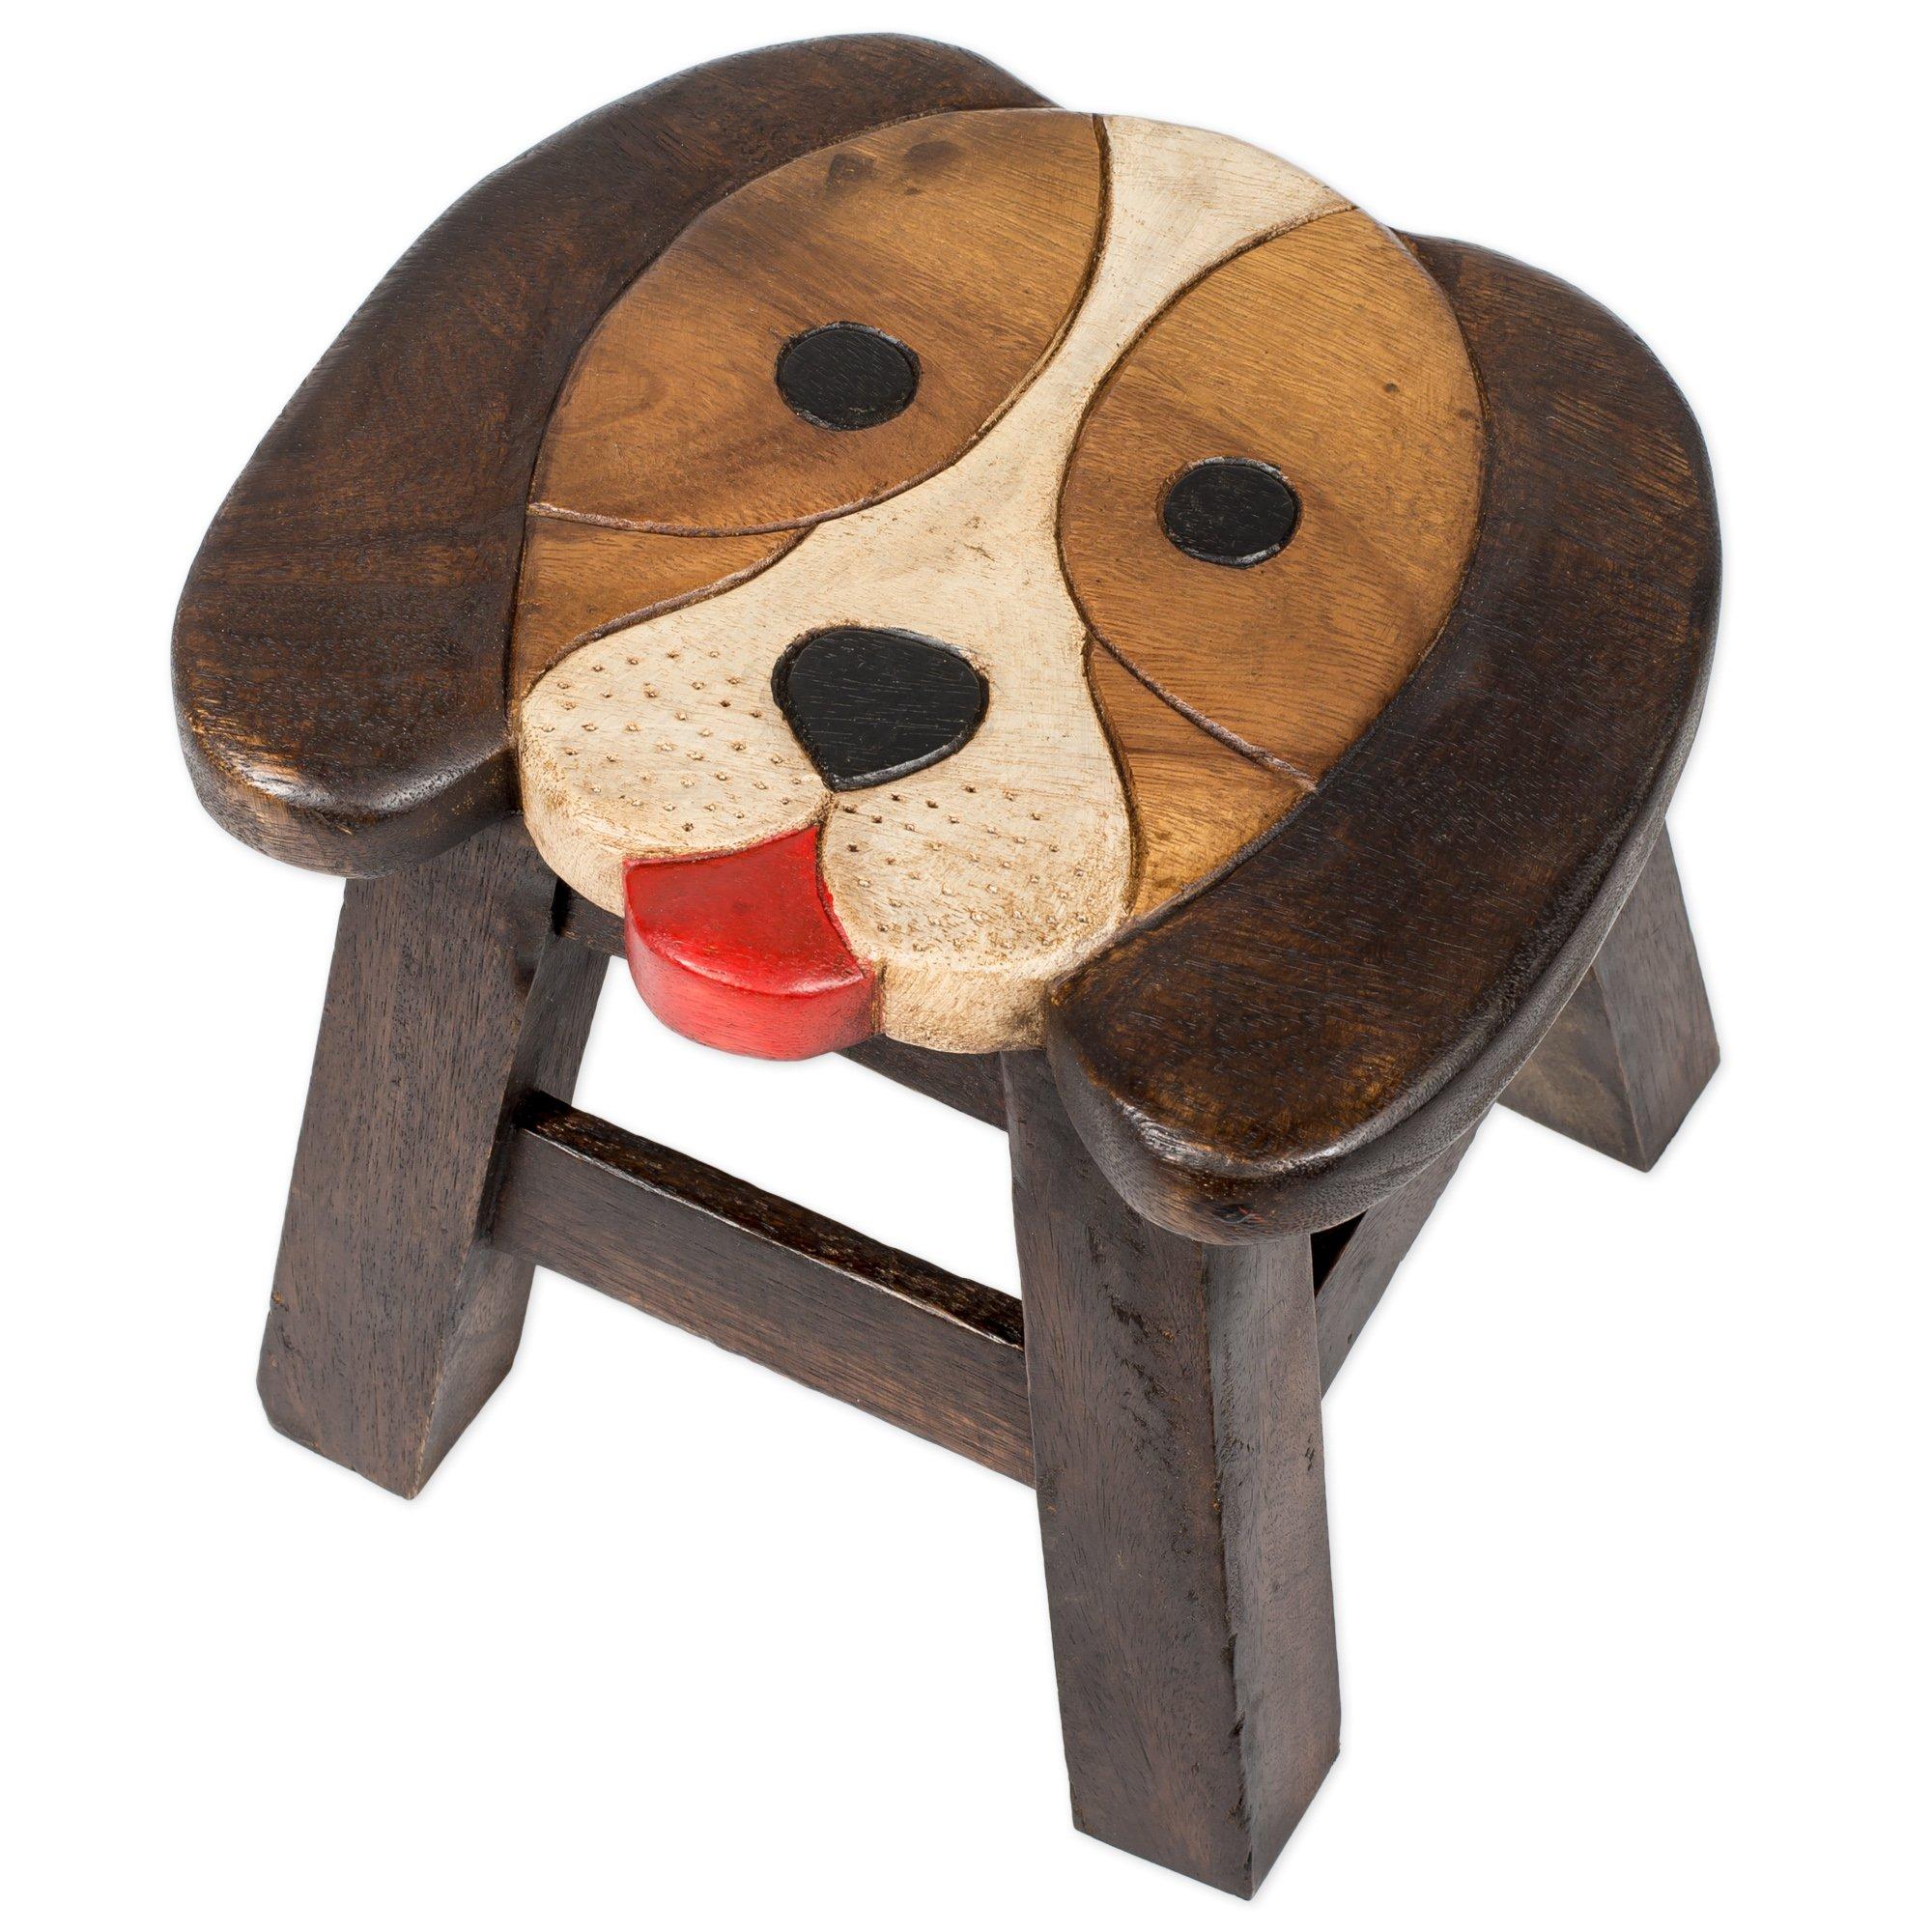 Puppy Dog Design Hand Carved Acacia Hardwood Decorative Short Stool by Sea Island Imports